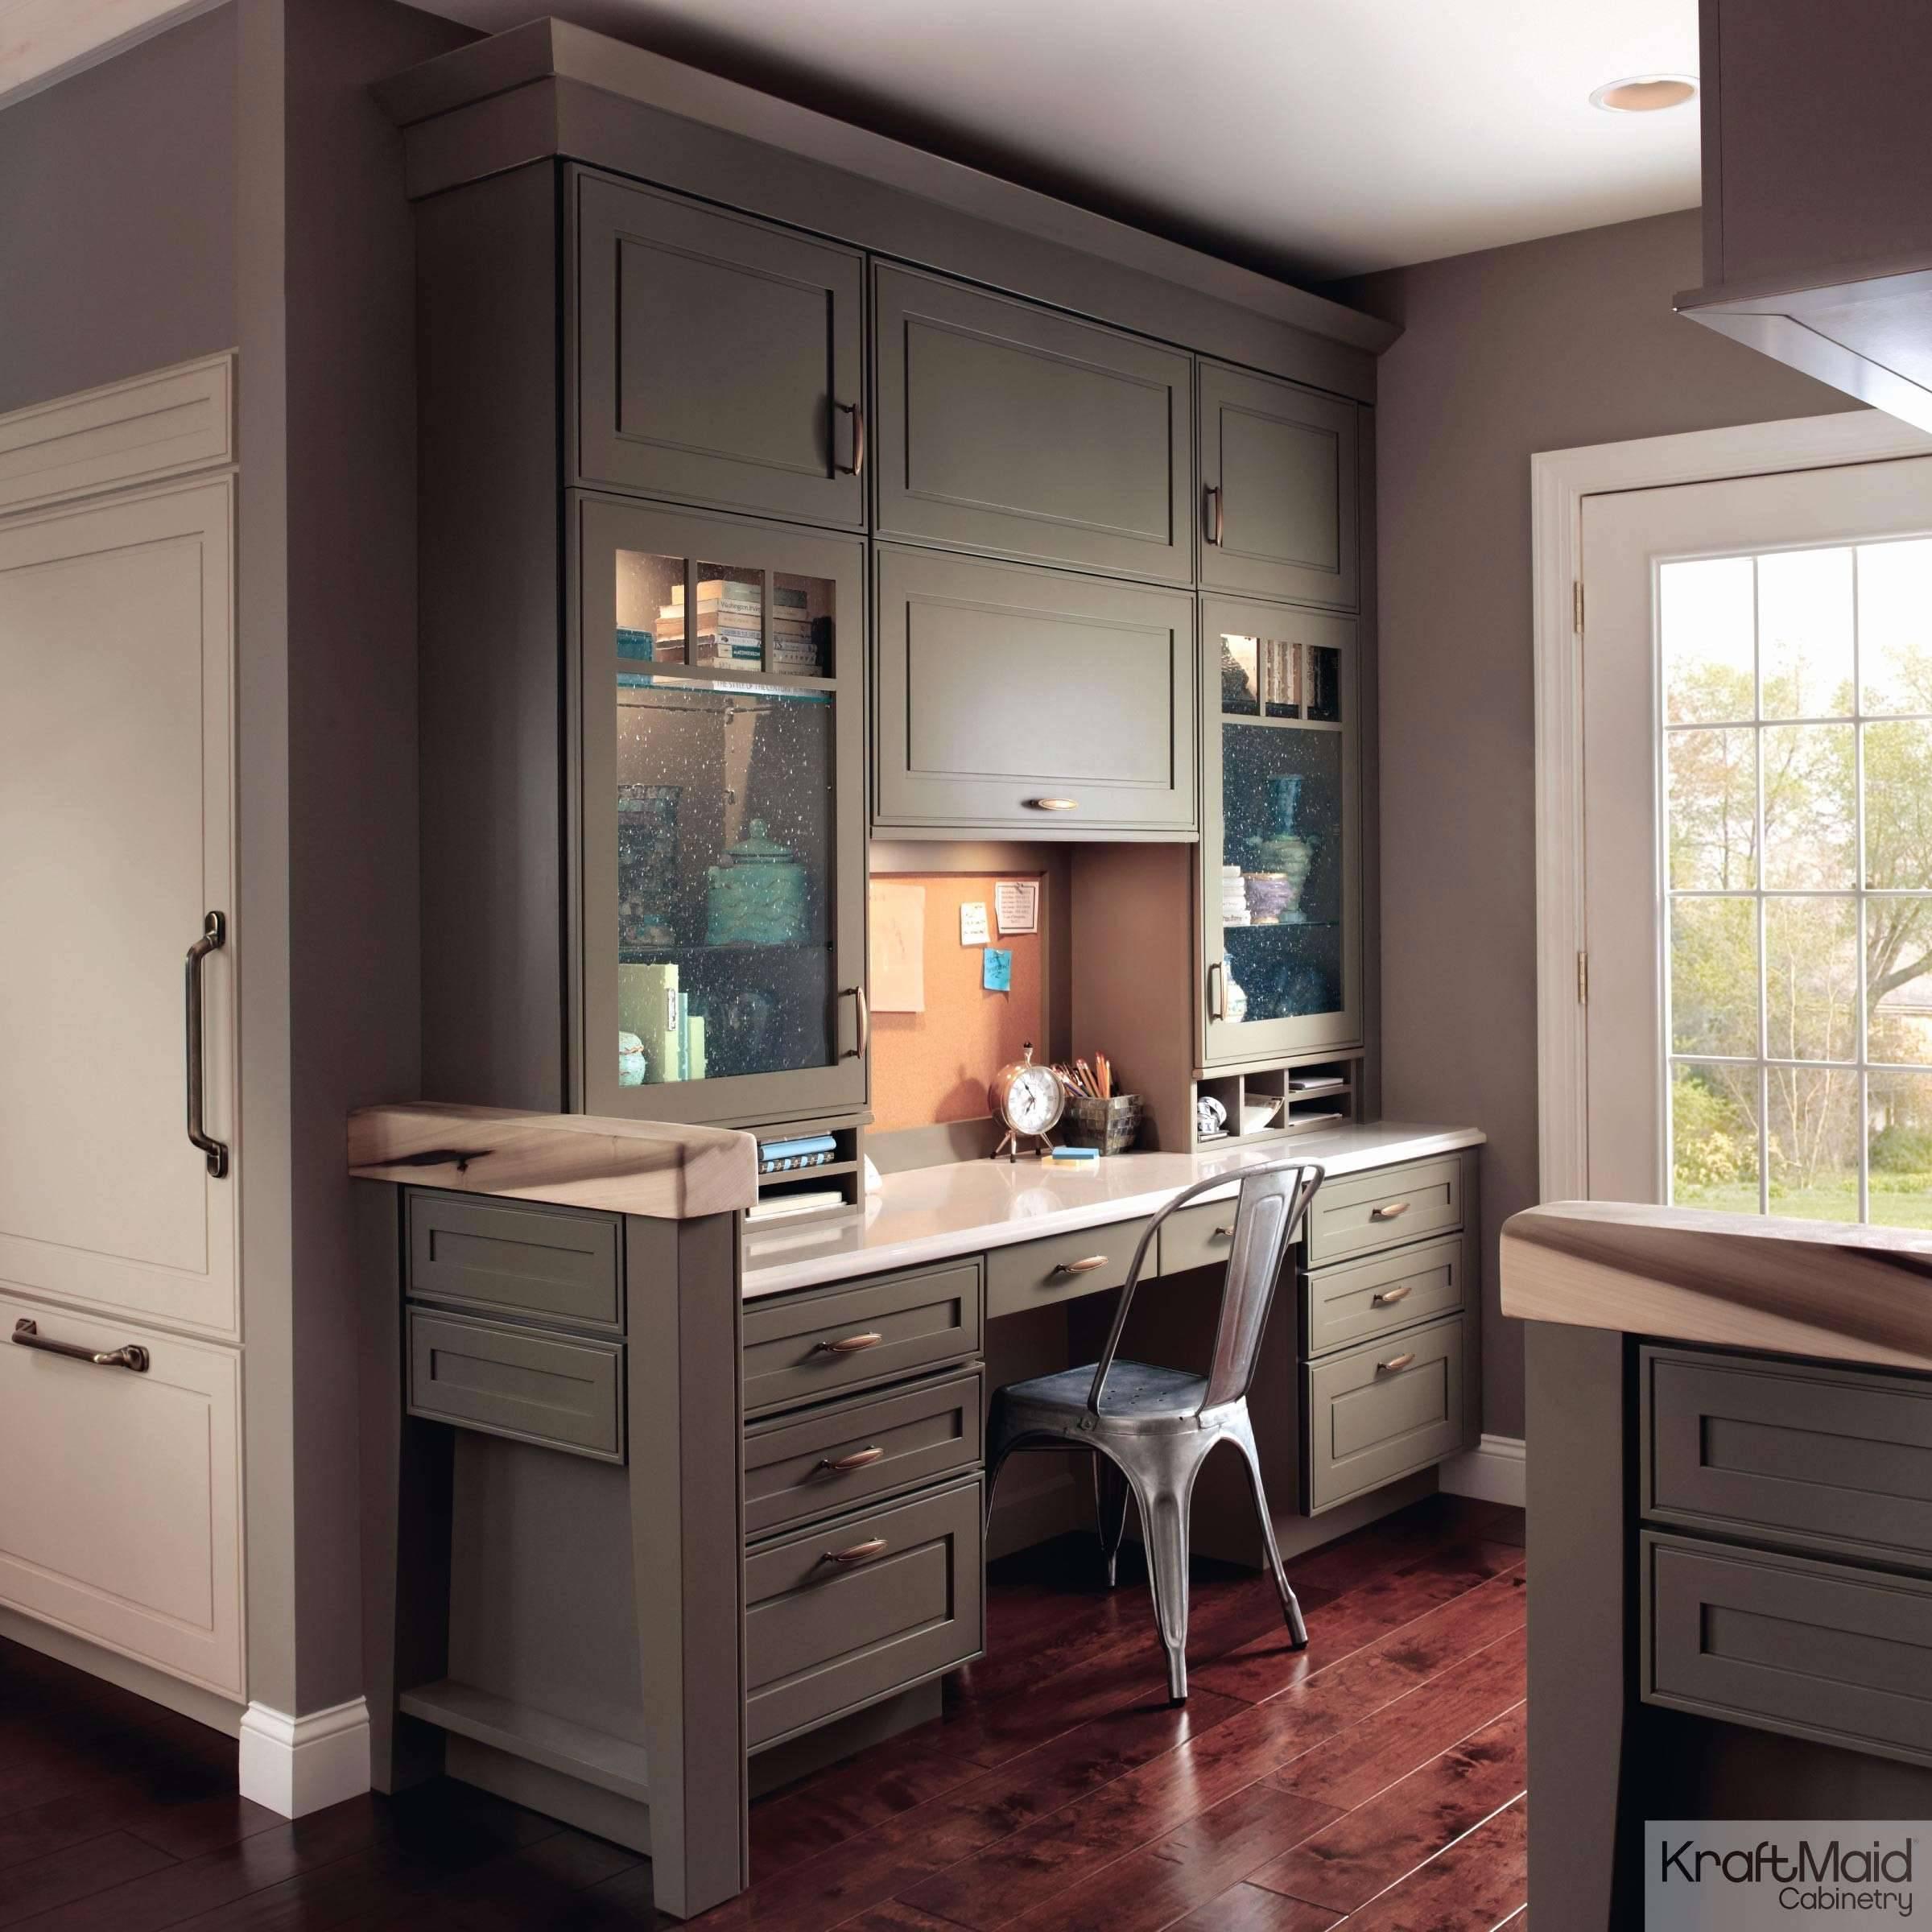 35 luxury backsplash ideas for small kitchen graph of kitchen counter backsplash ideas pictures